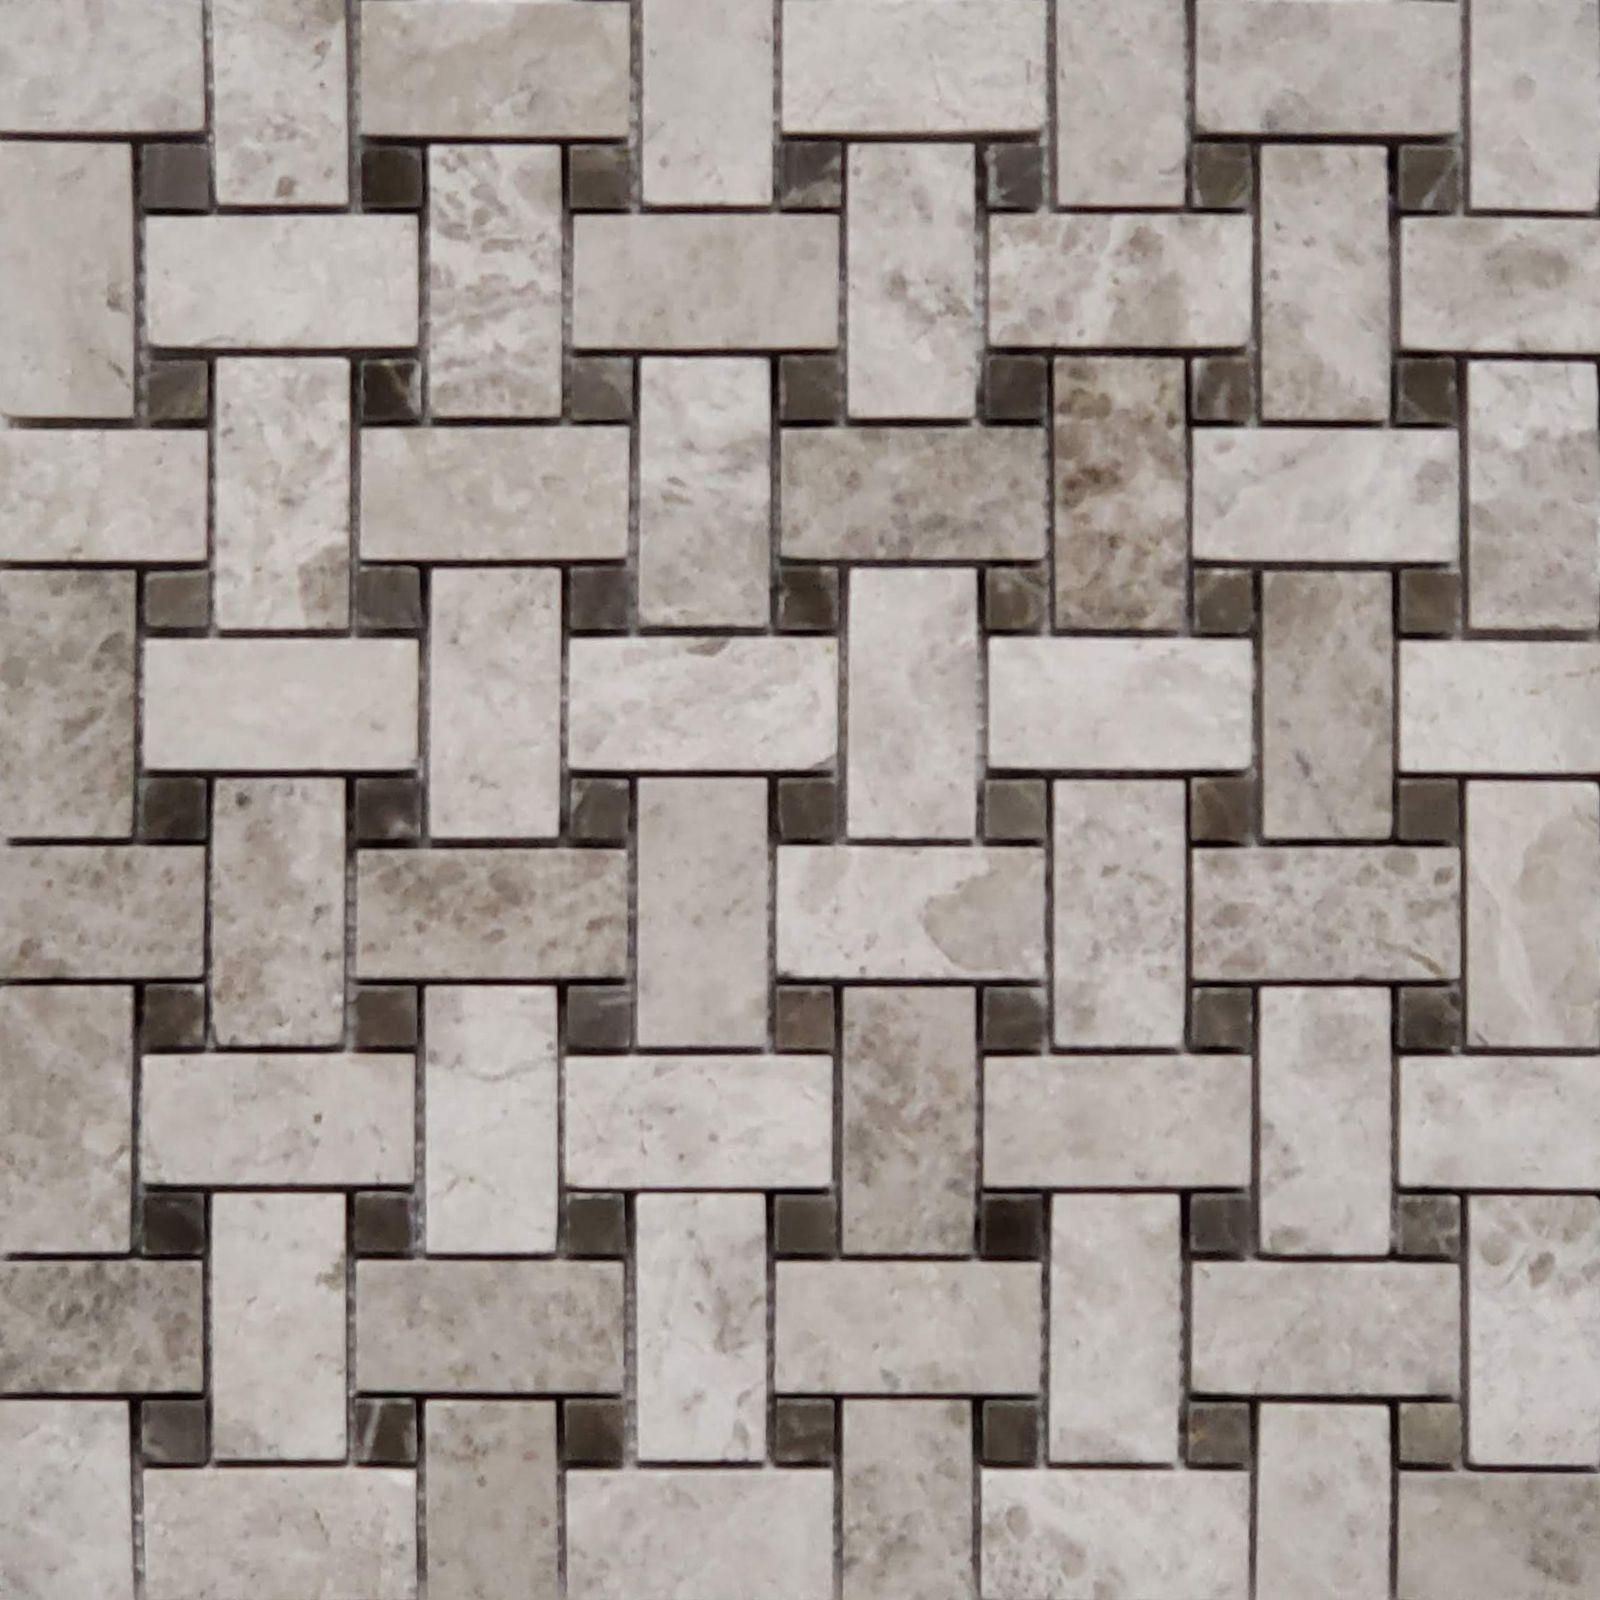 - Basketweave Tile Mosaic Tundra Grey Basket Weave Tile, Flooring